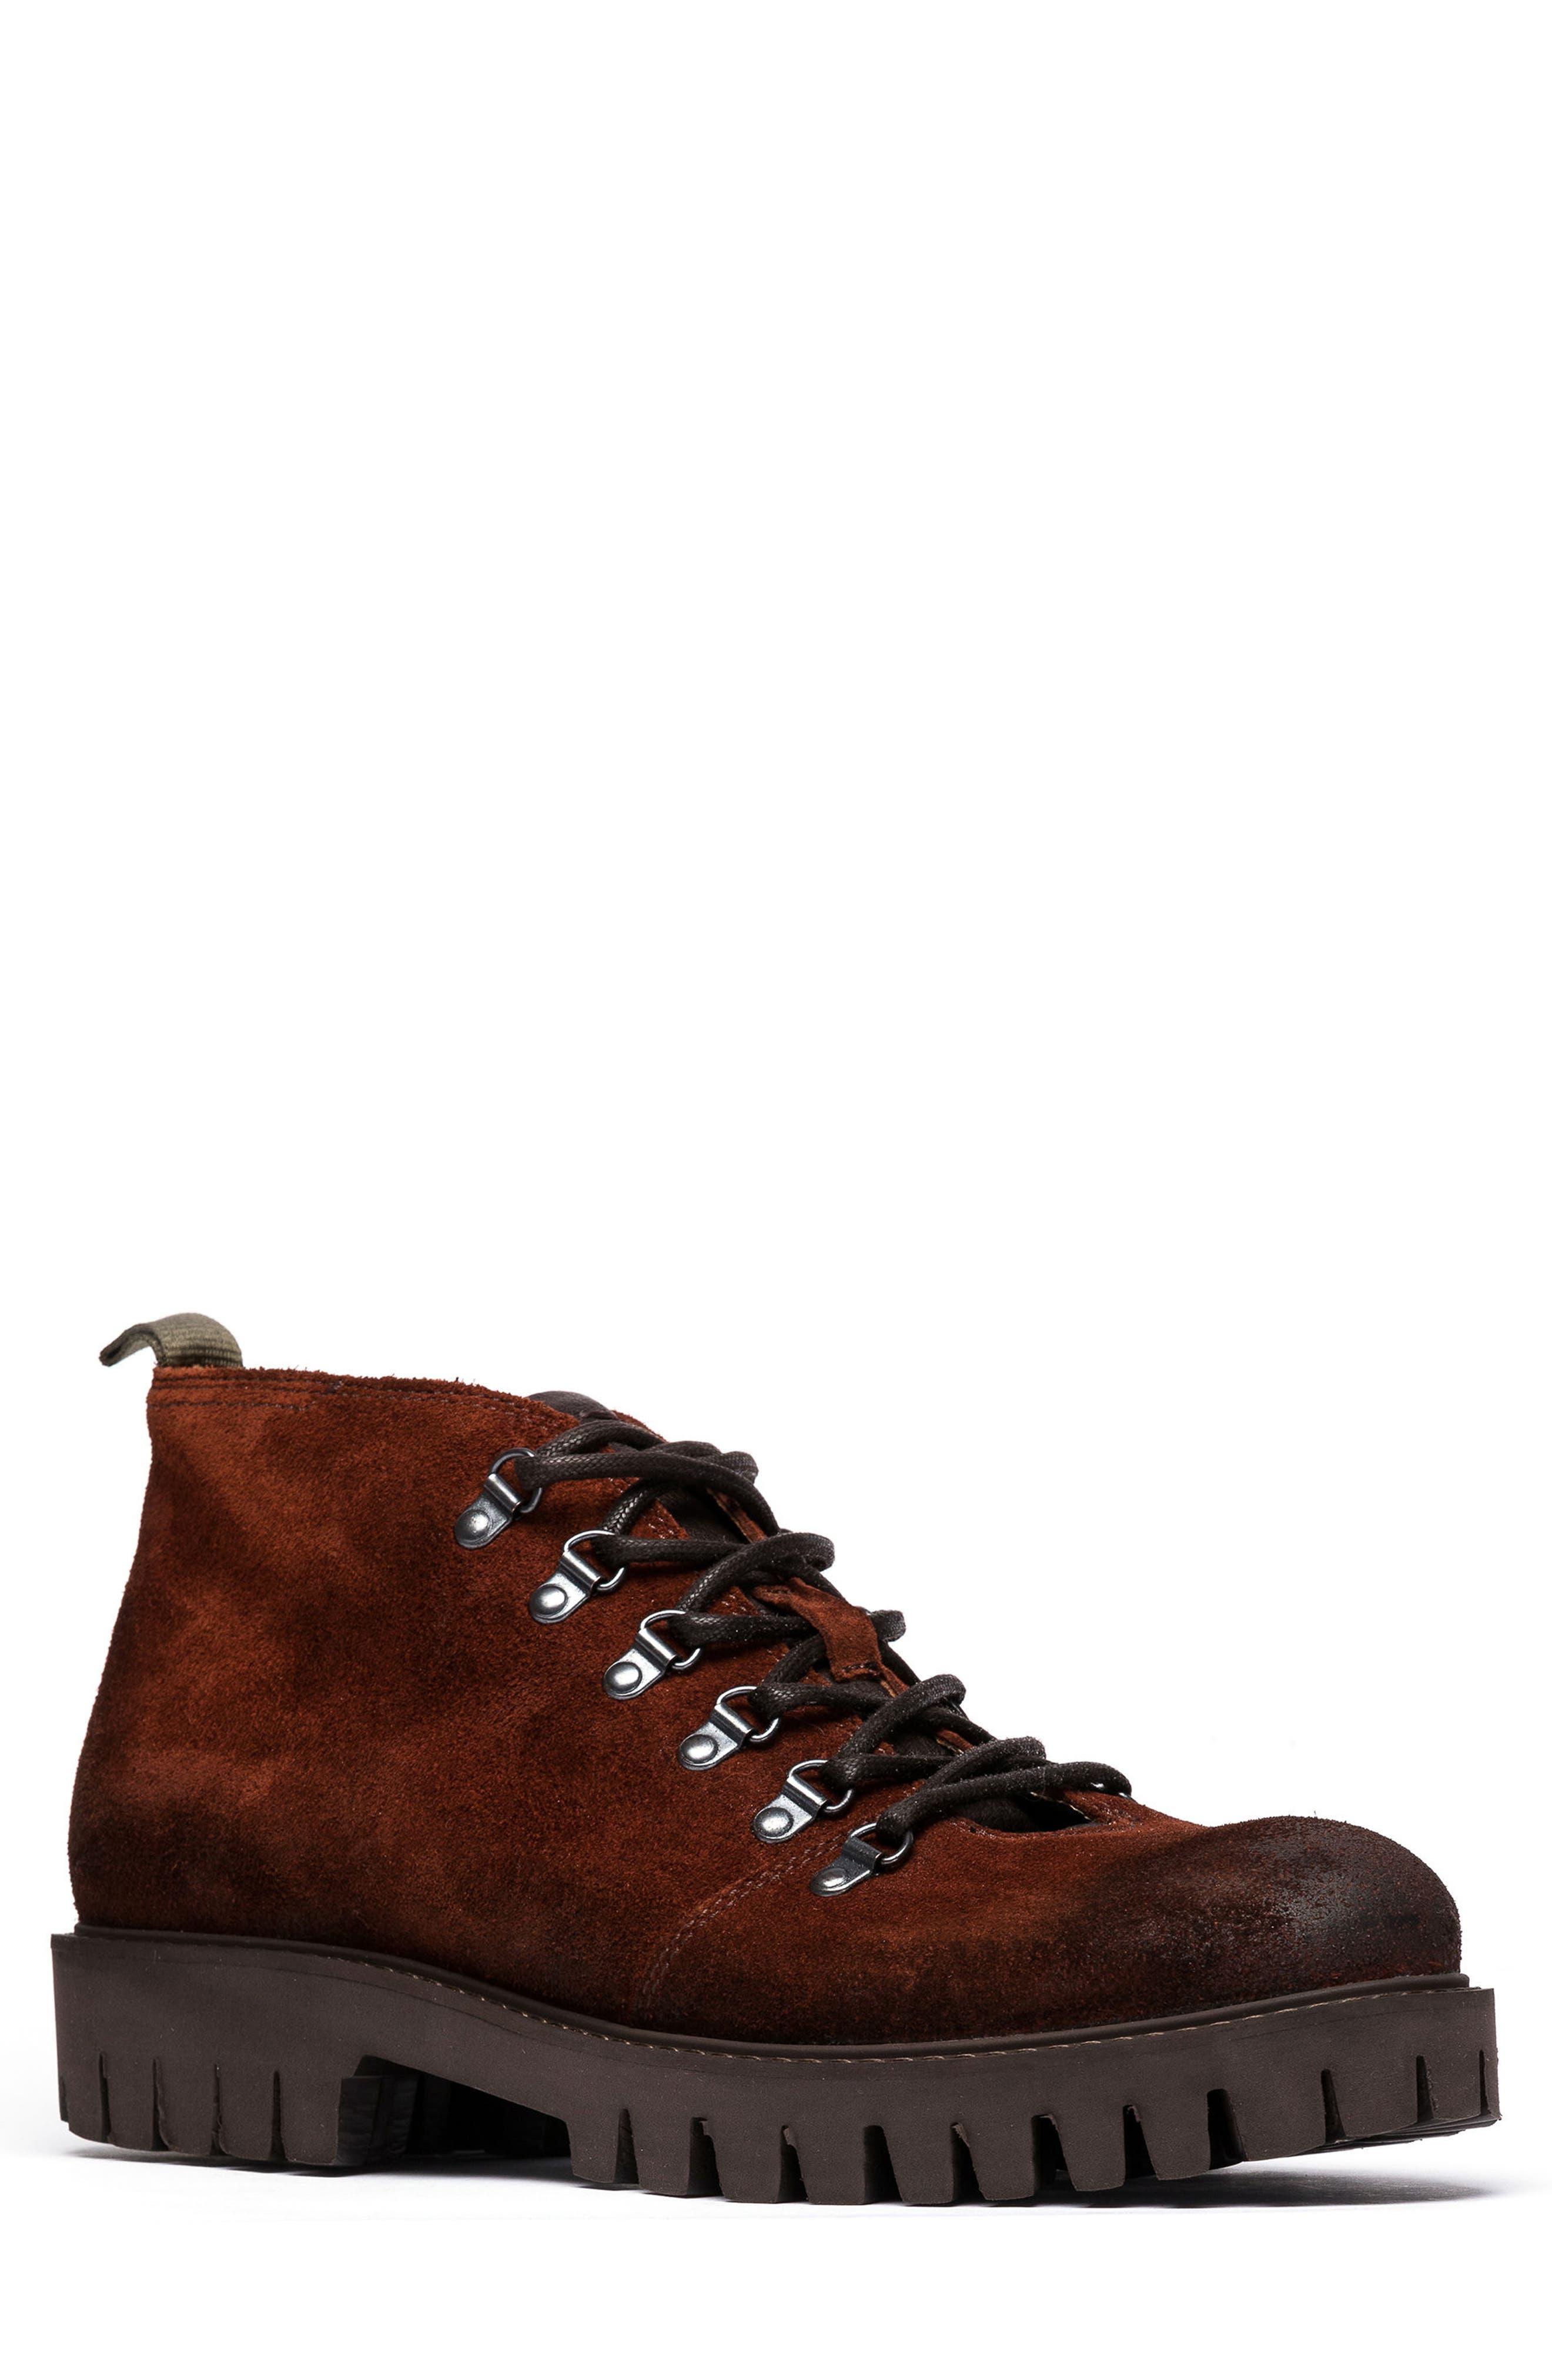 Rodd & Gunn Rees River Lugged Boot (Men)